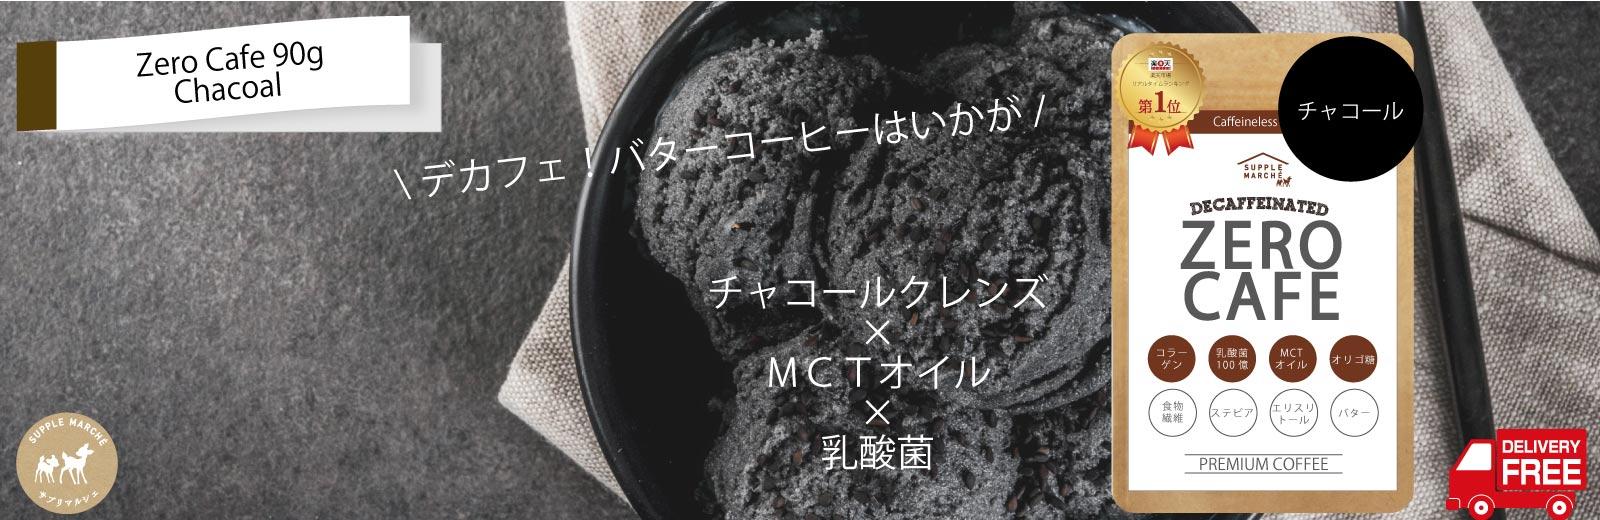 main_suiso